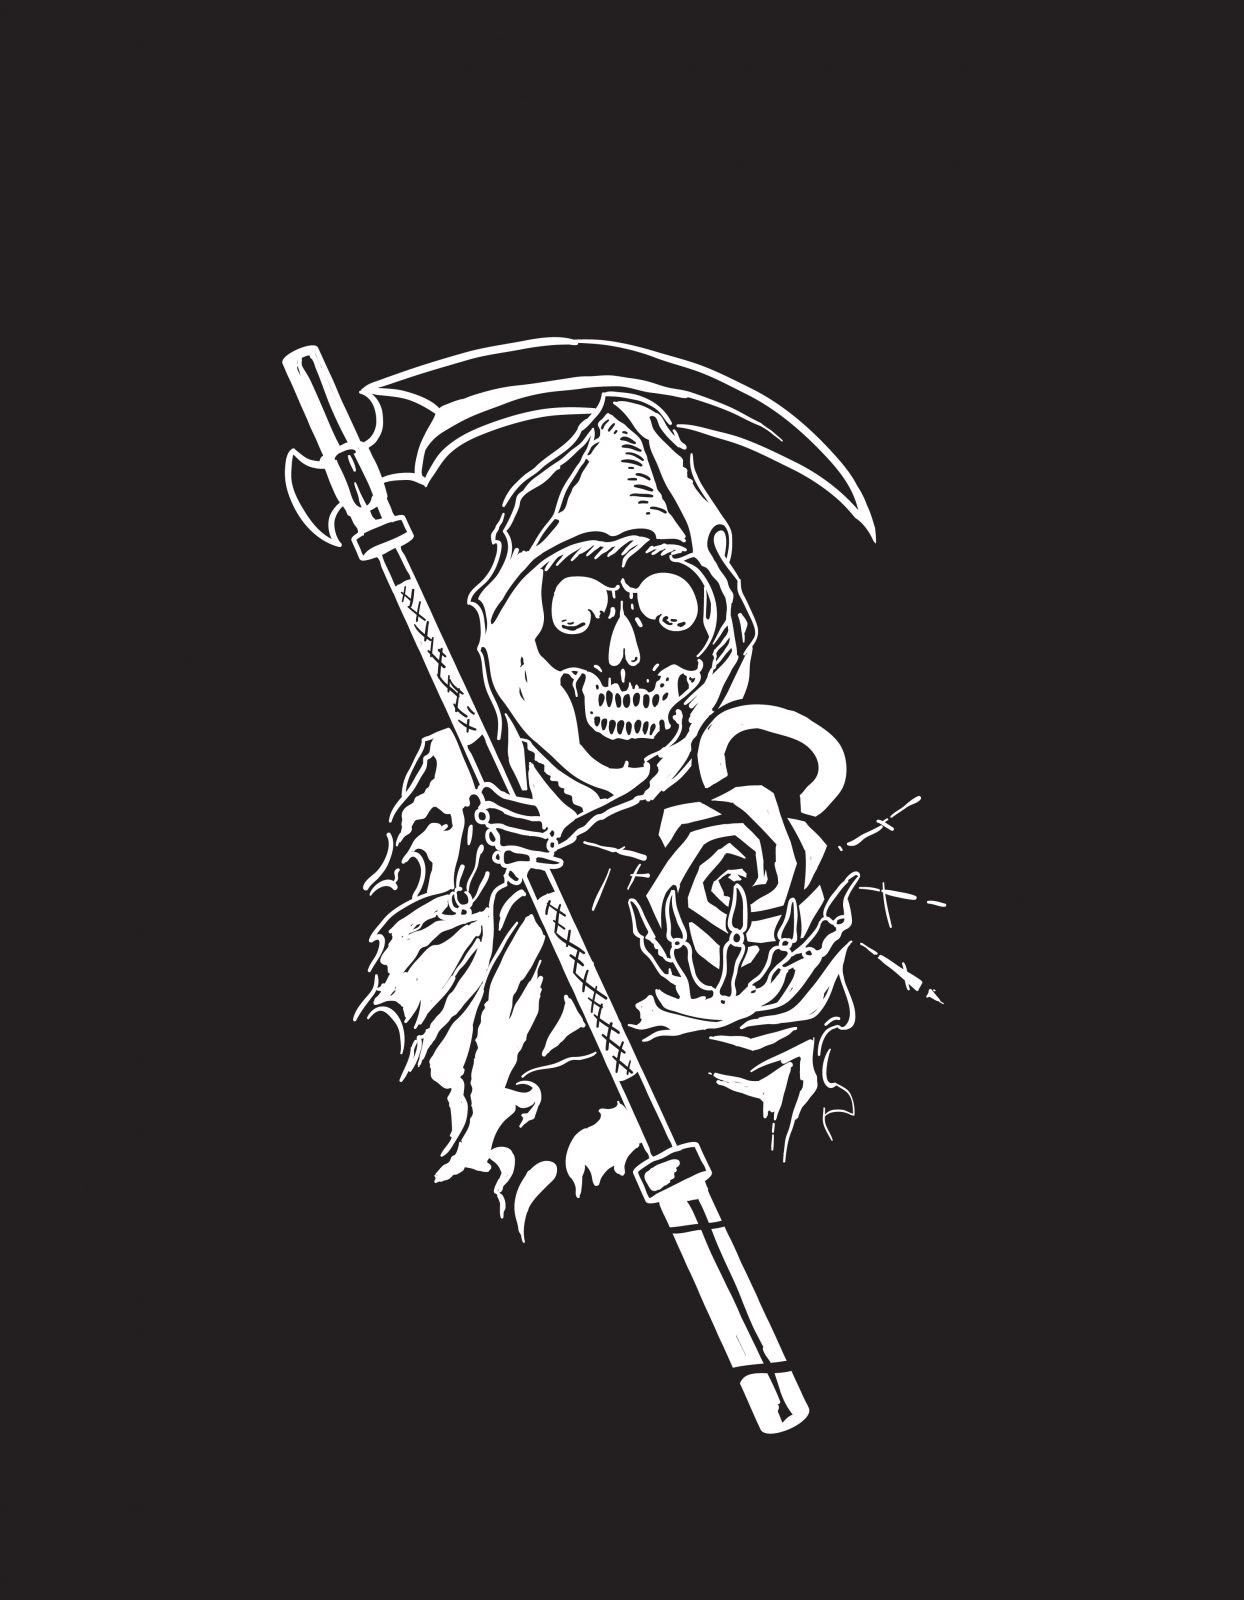 mens-gauntlet-logo